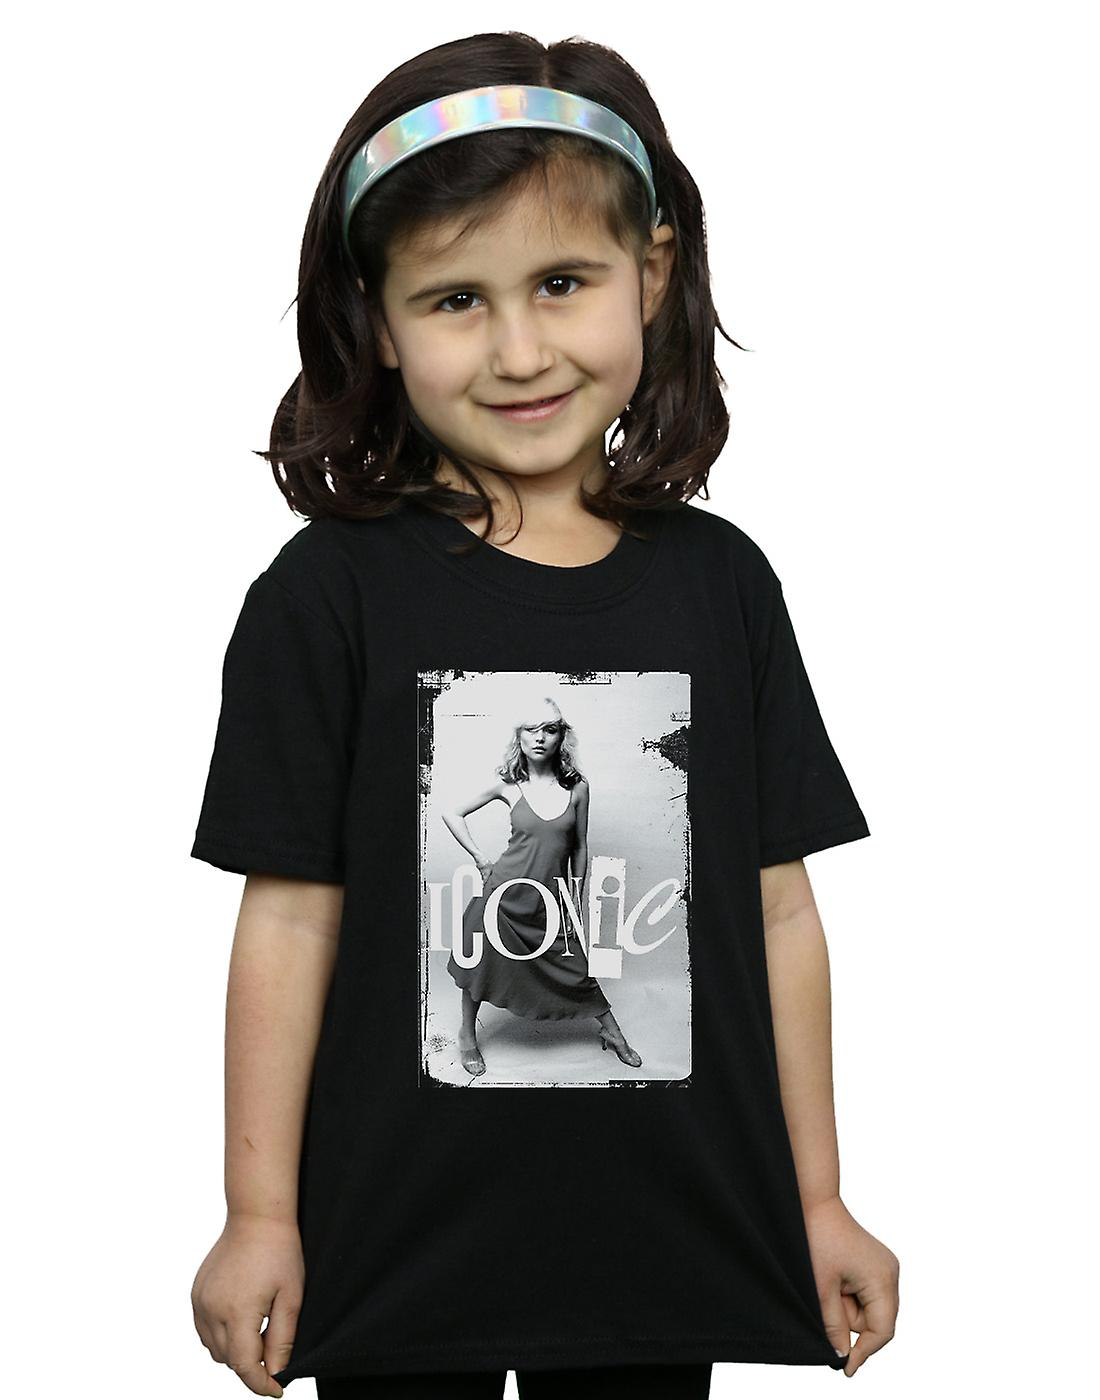 a084e1152330 Debbie Harry jenter ikoniske bildet t-skjorte